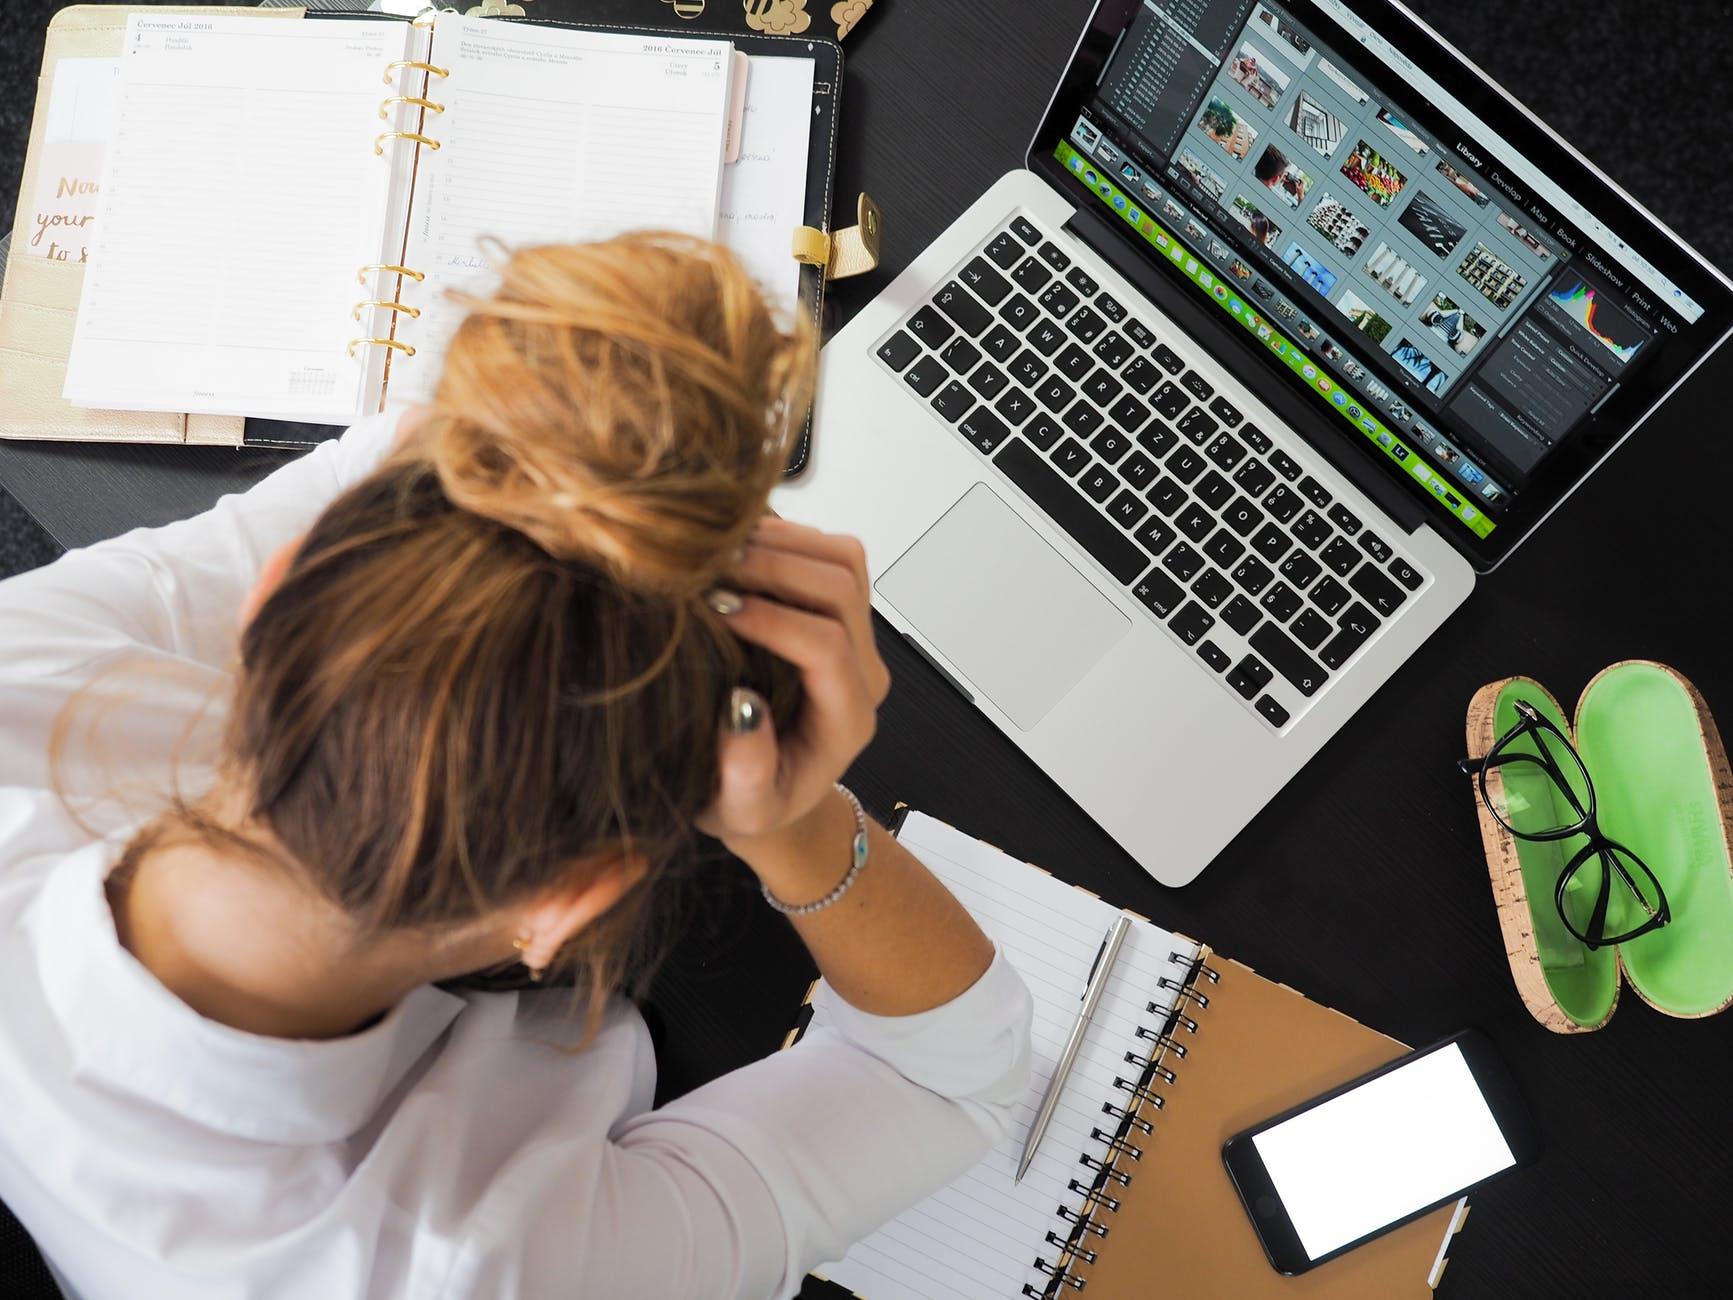 Negative Factors of Slow Internet